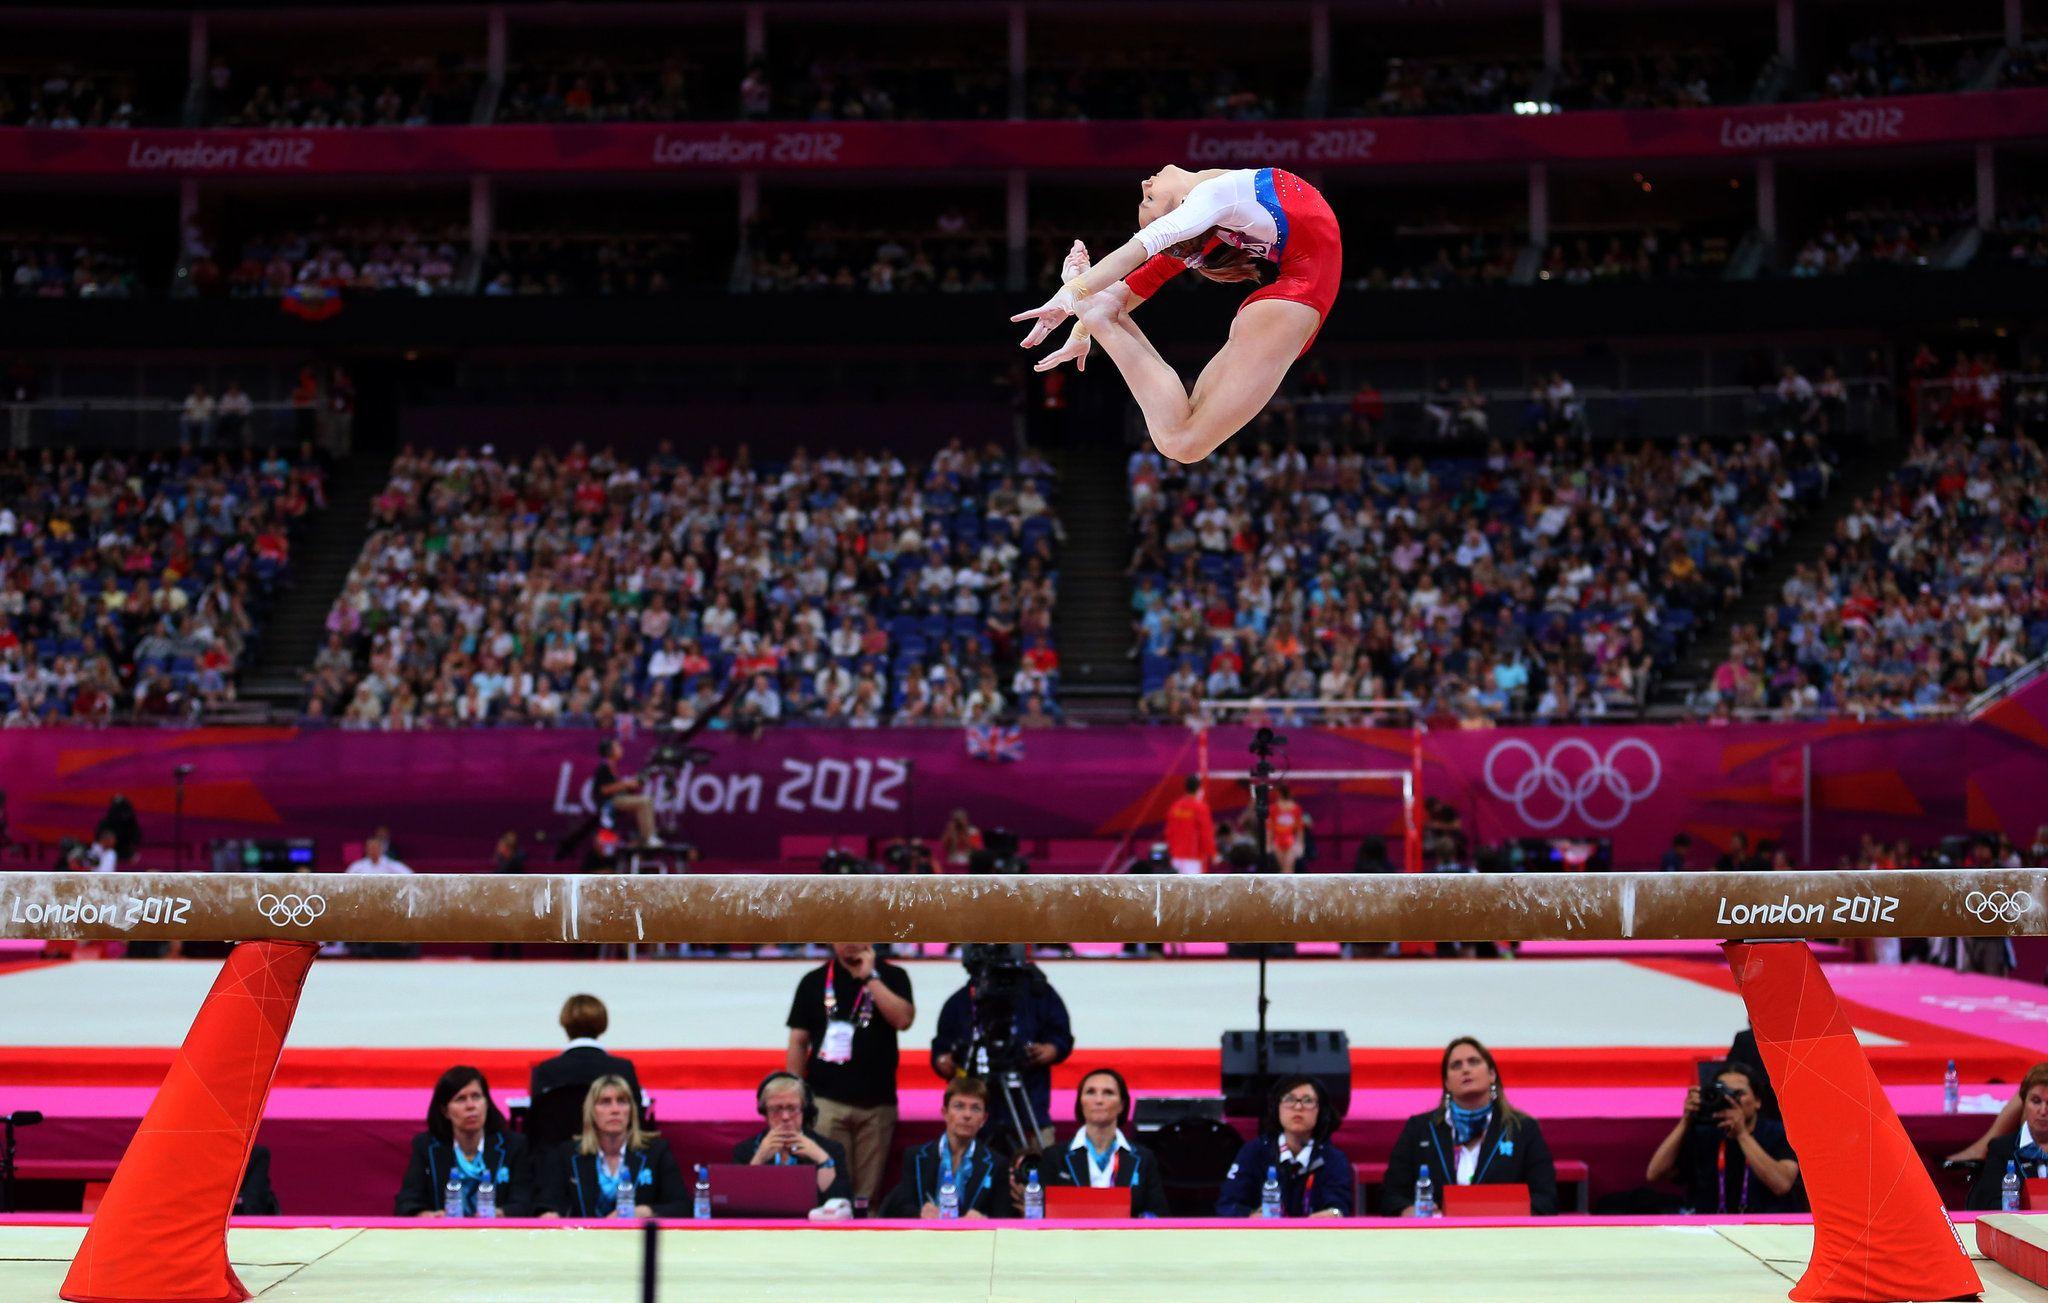 Viktoria Komova on balance beam at the 2012 Olympics ... Balance Beam Gymnastics Olympics